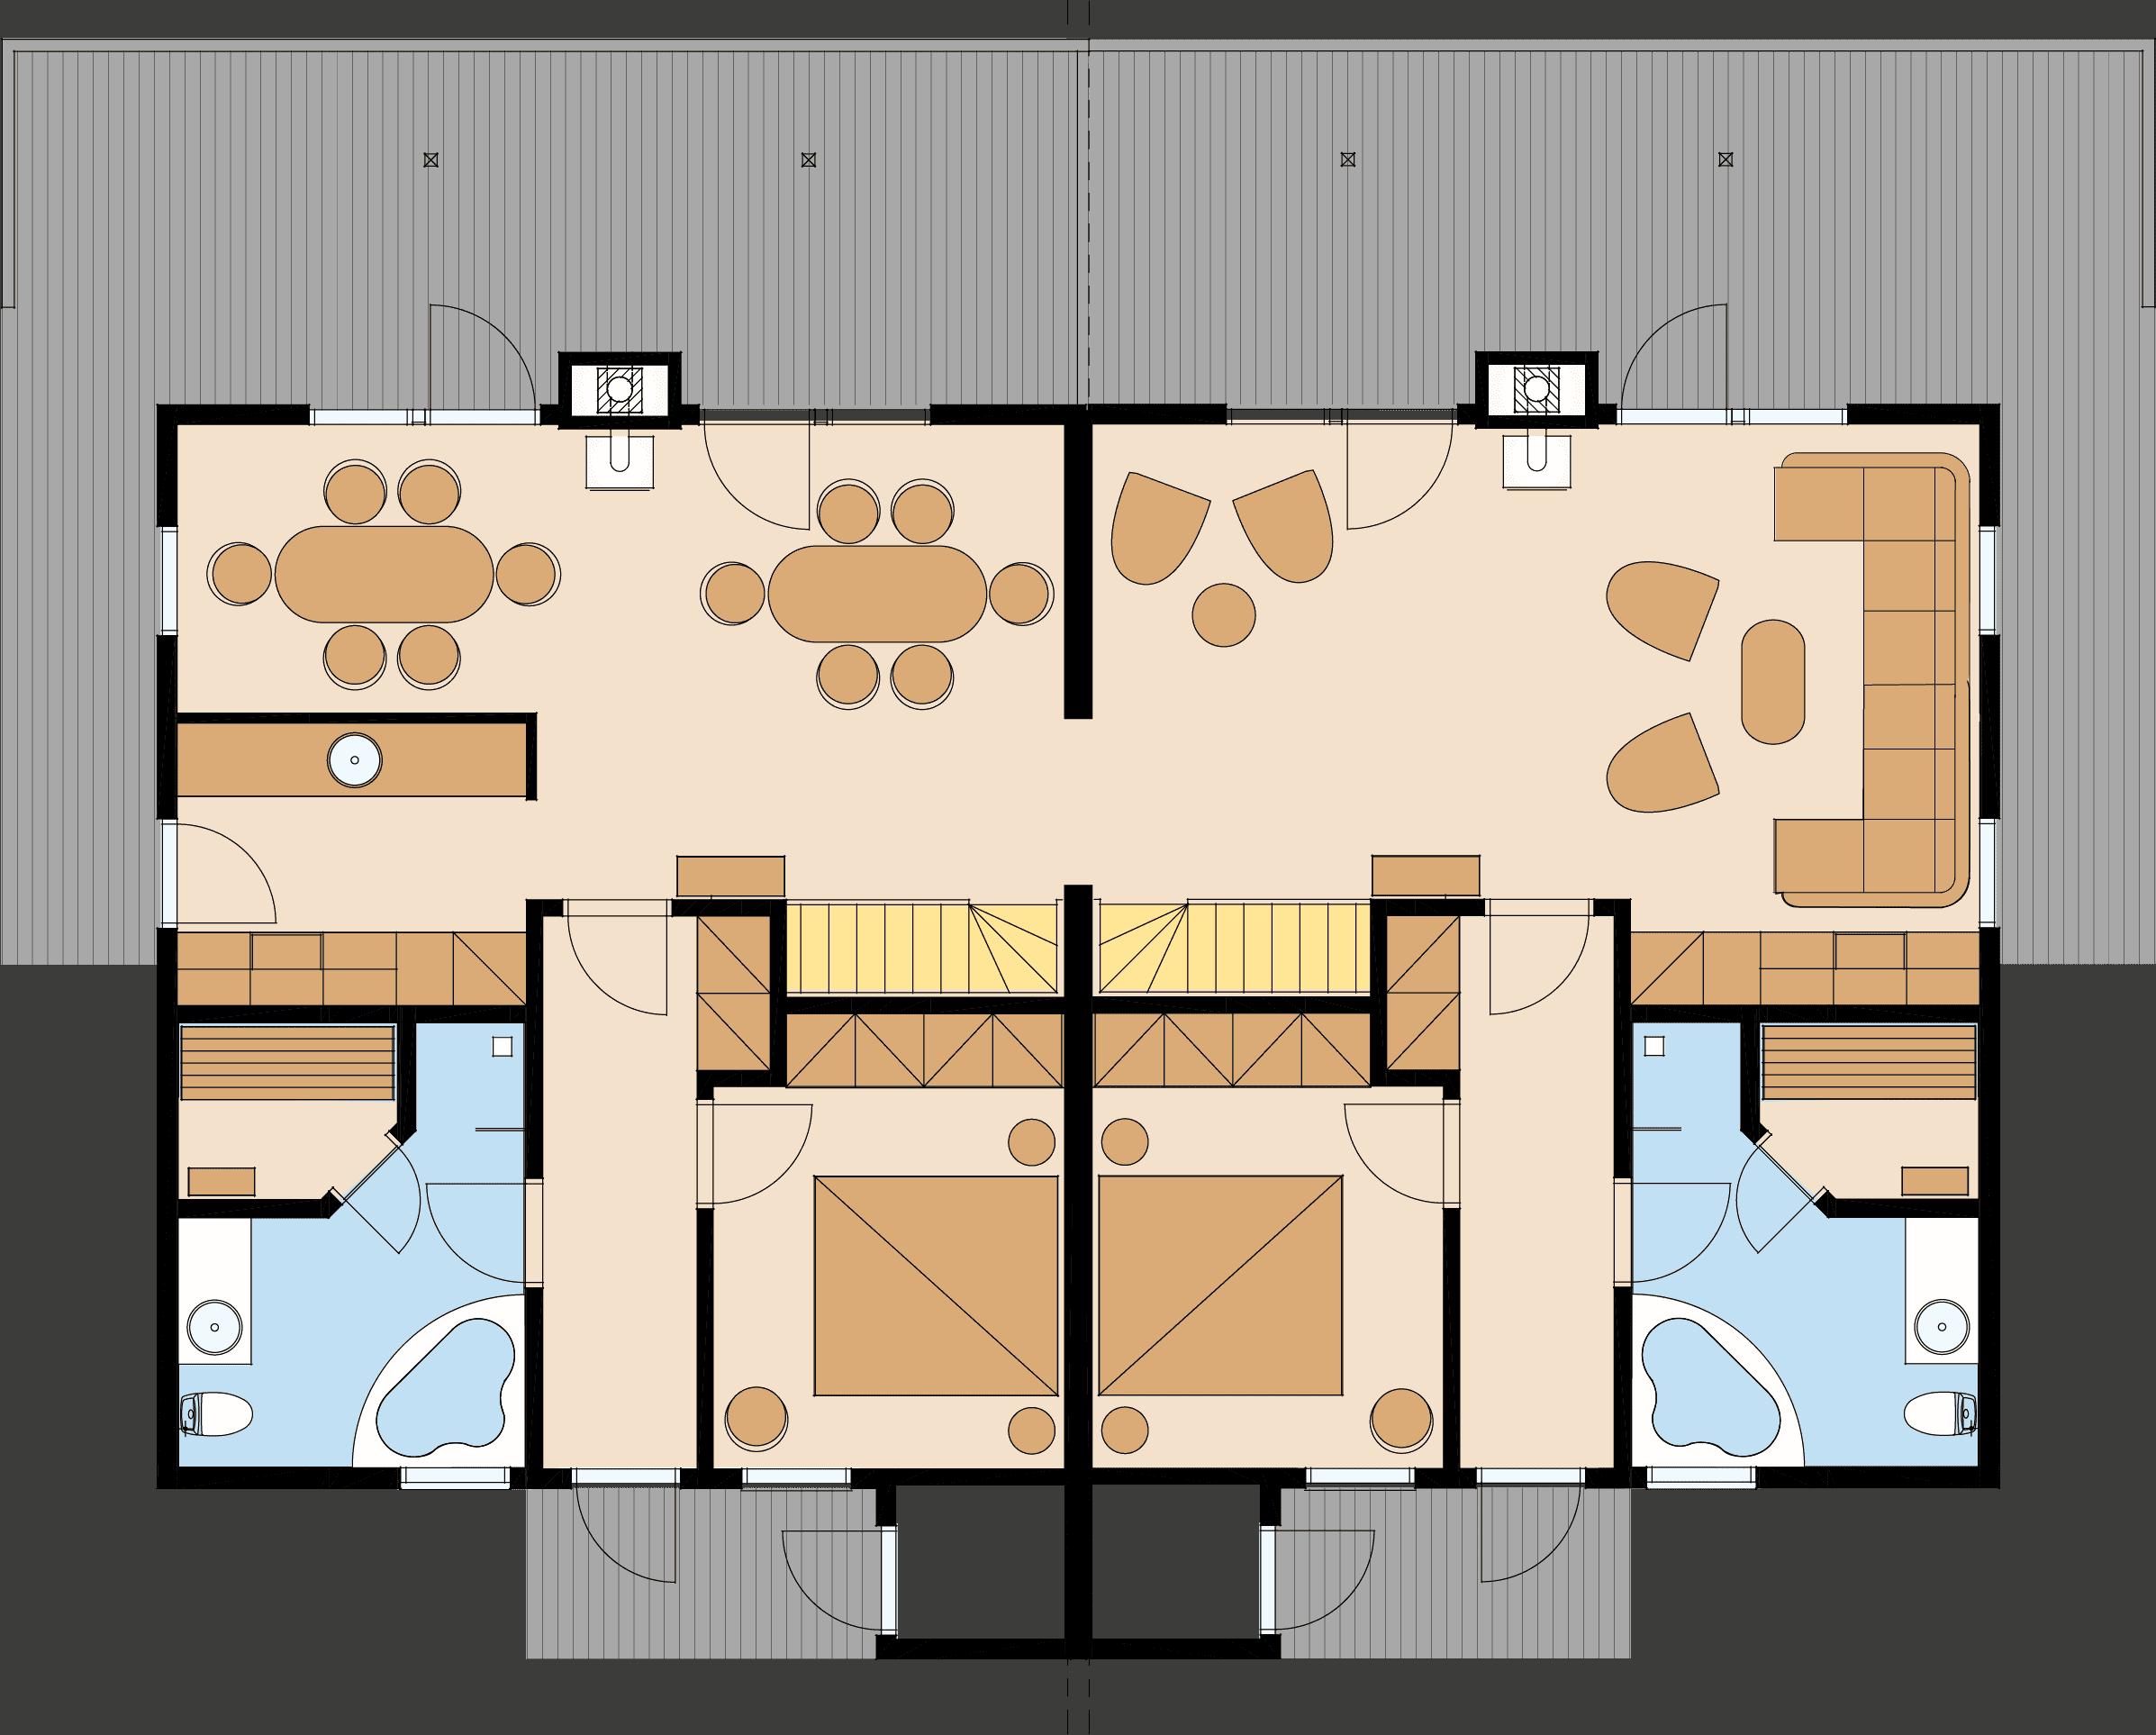 Ferienhaus Fünen XXL in Bad Saarow – Ansicht Grundriss des Erdgeschosses